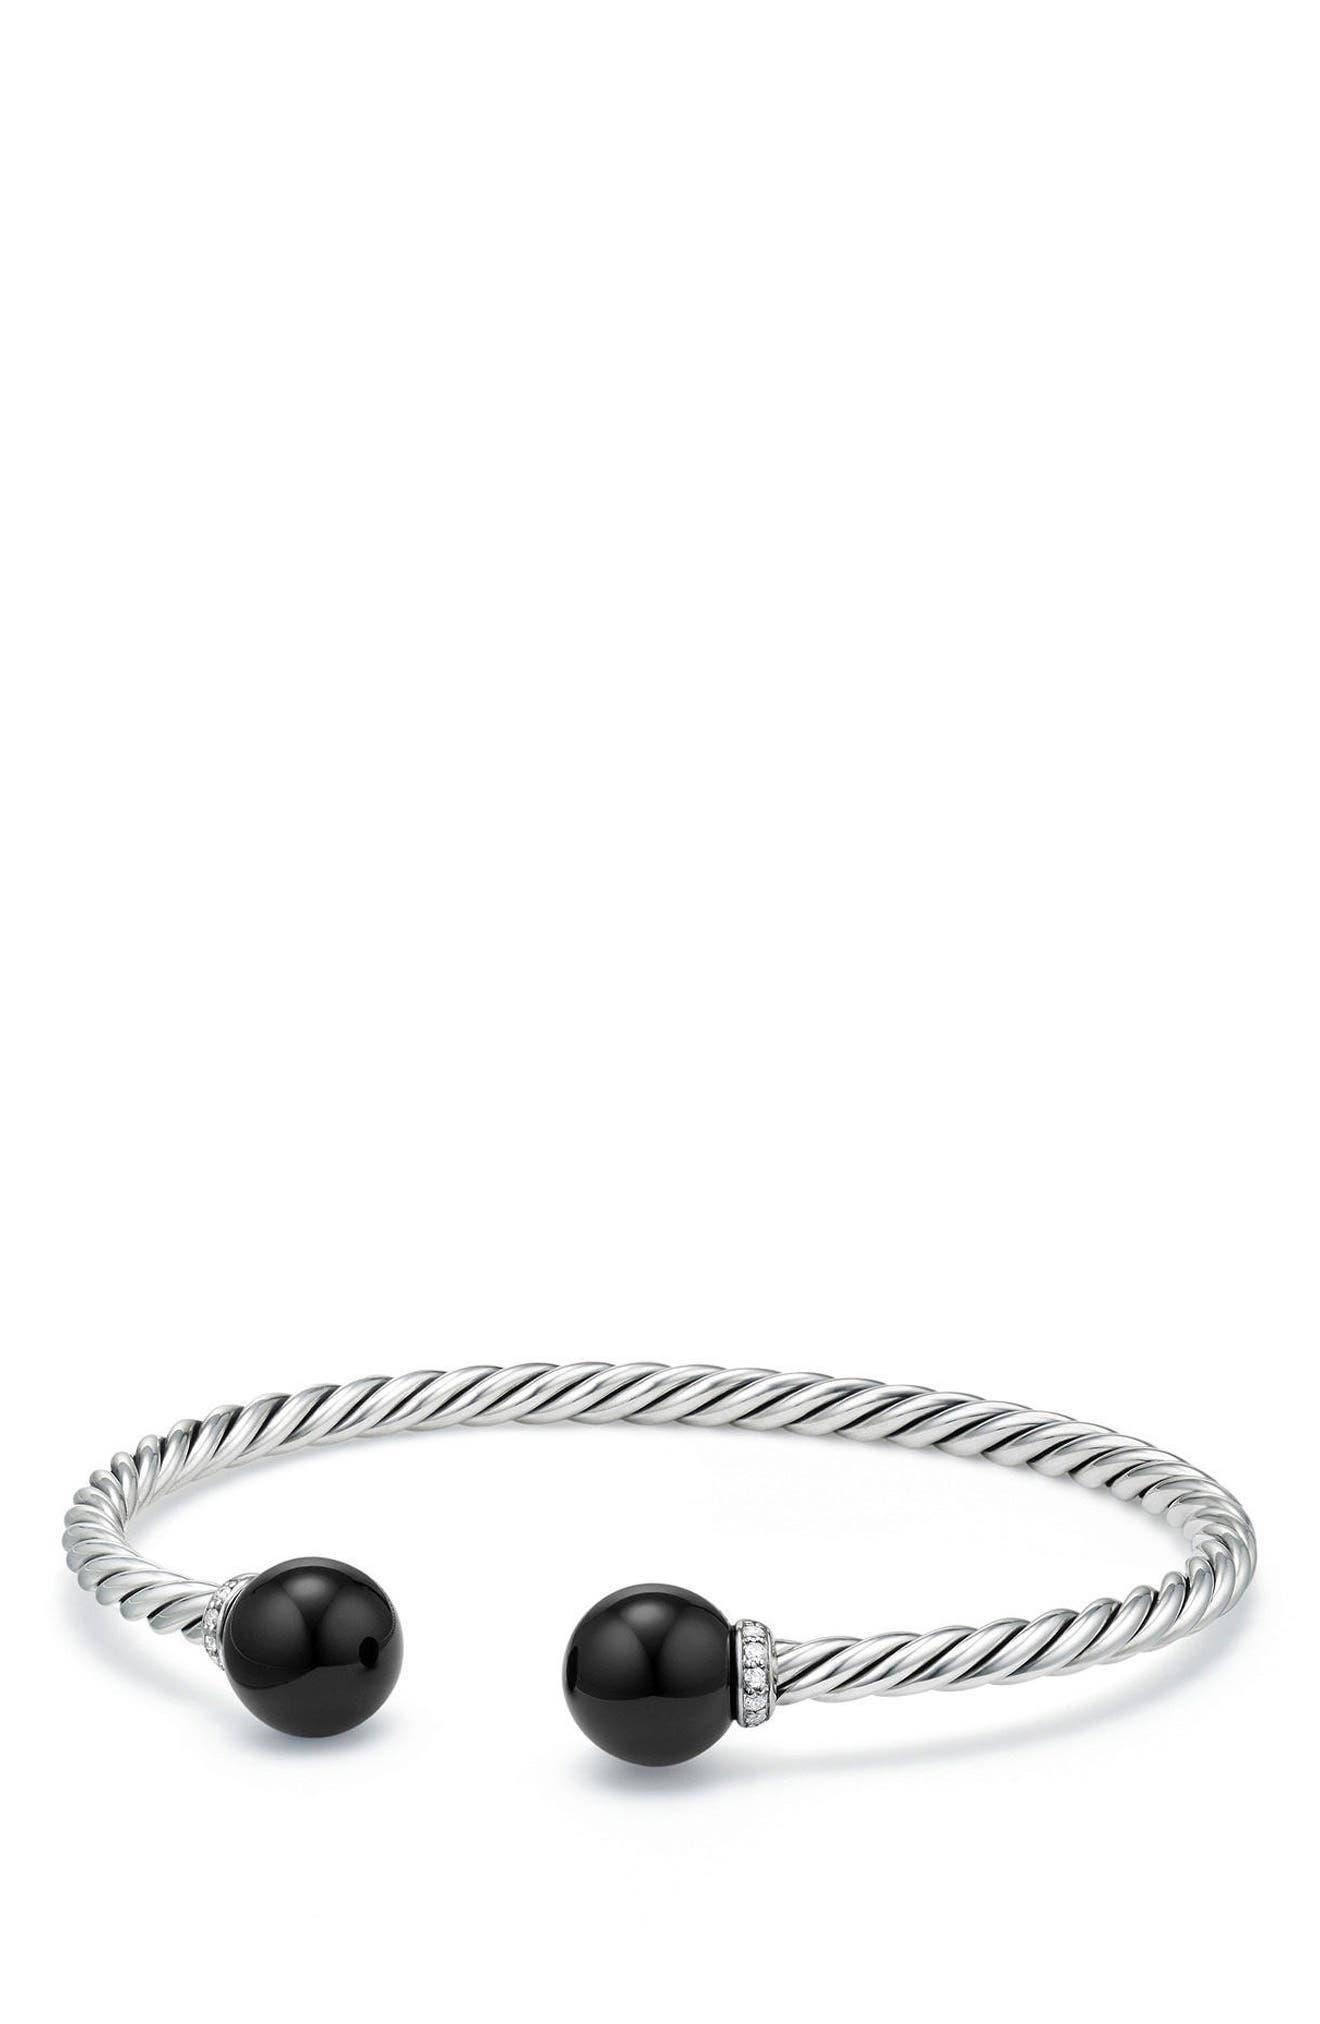 David Yurman Solari Bead Bracelet with Diamonds